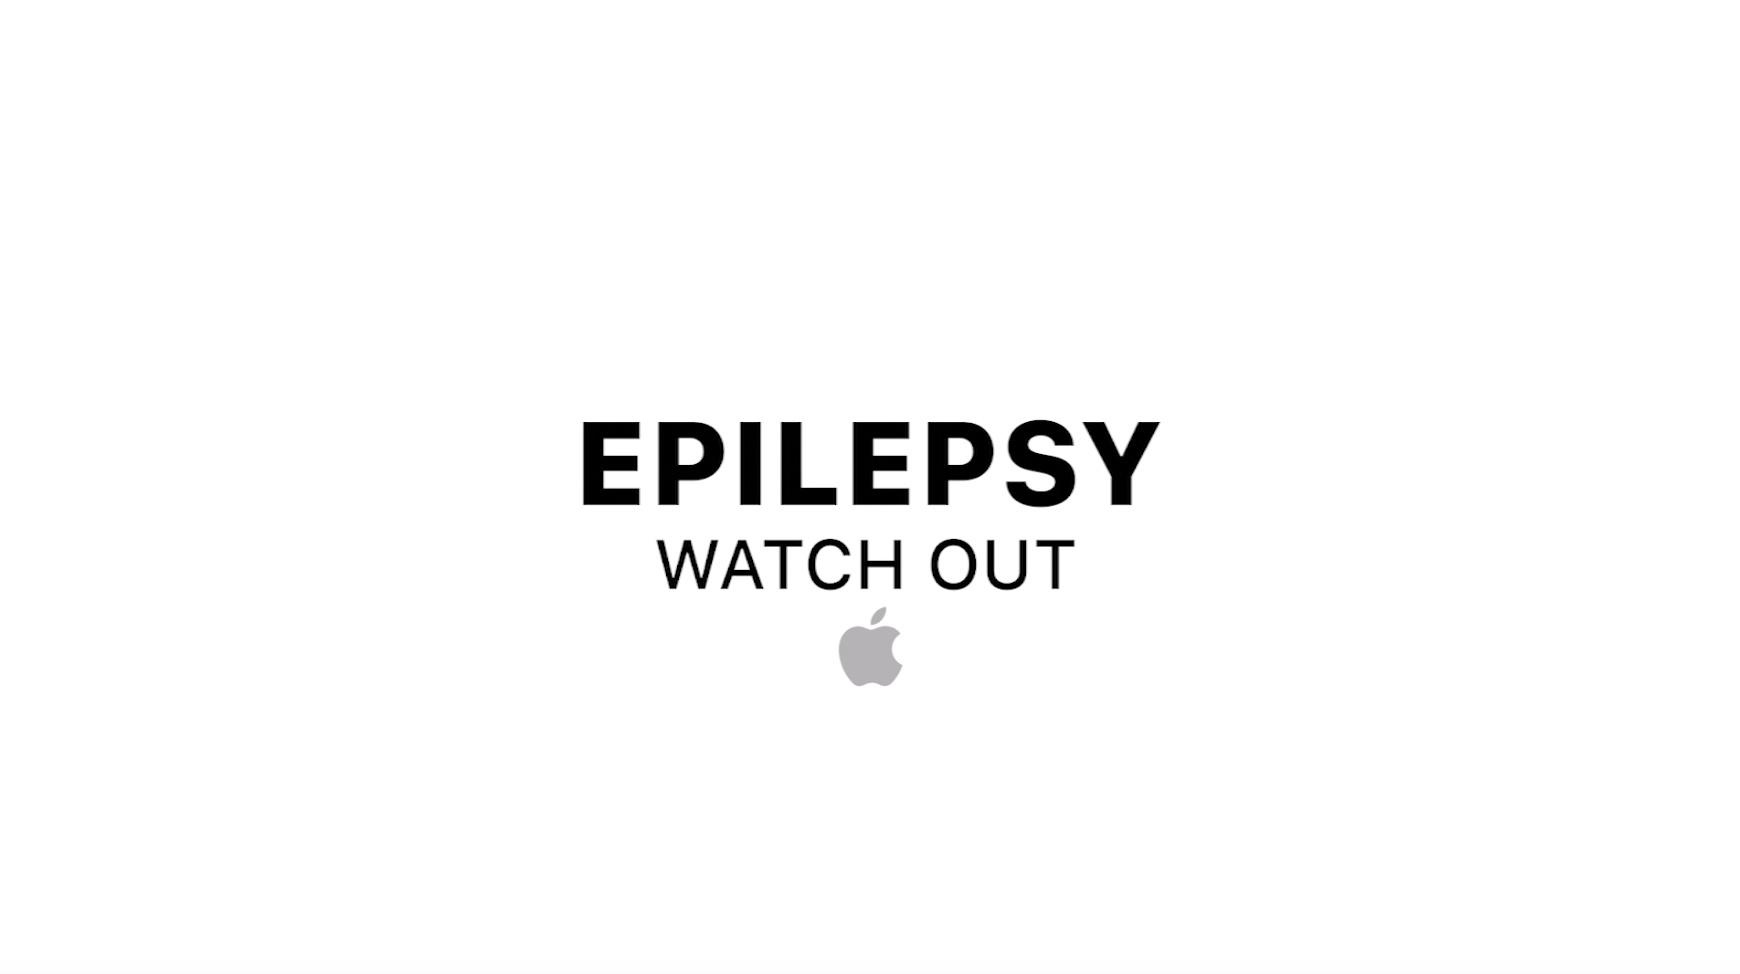 Apple_Epilepsy Watch Out  Thumbnail